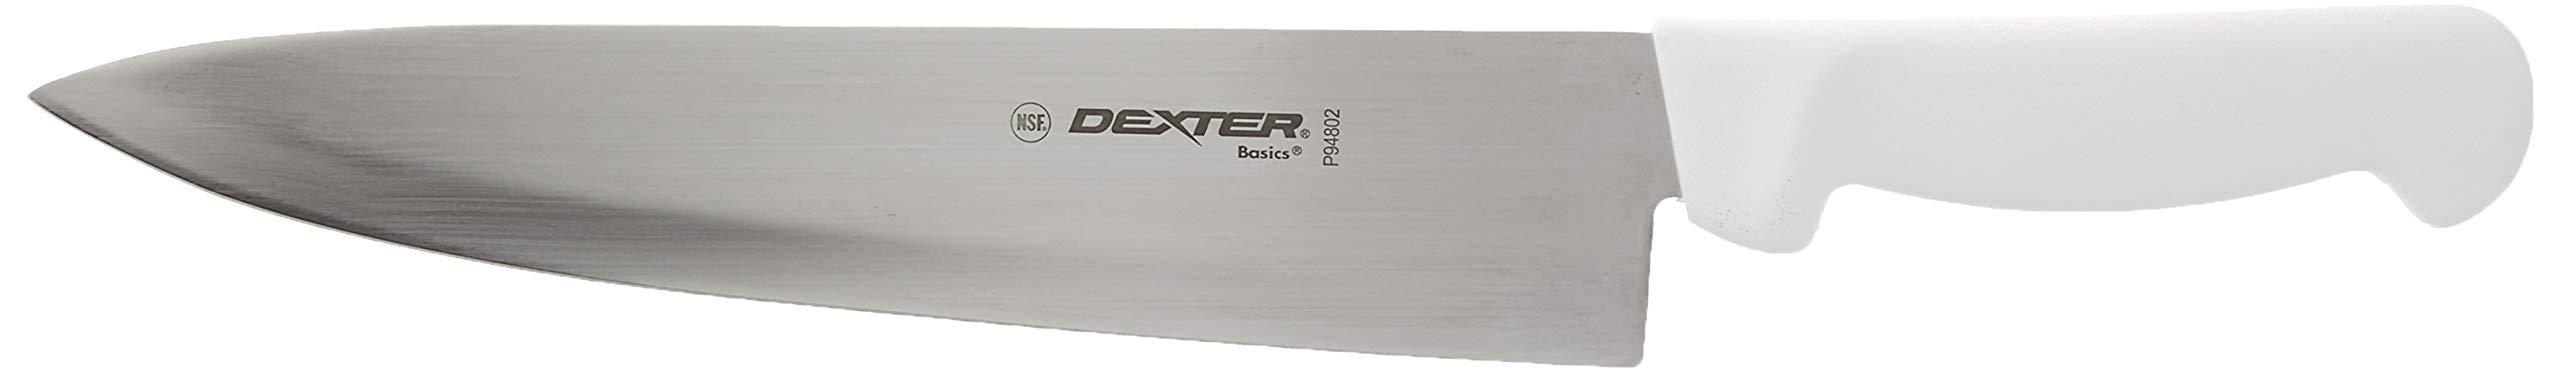 Dexter Russell P94802 Basics 10'' Cooks Knife w/White Handle